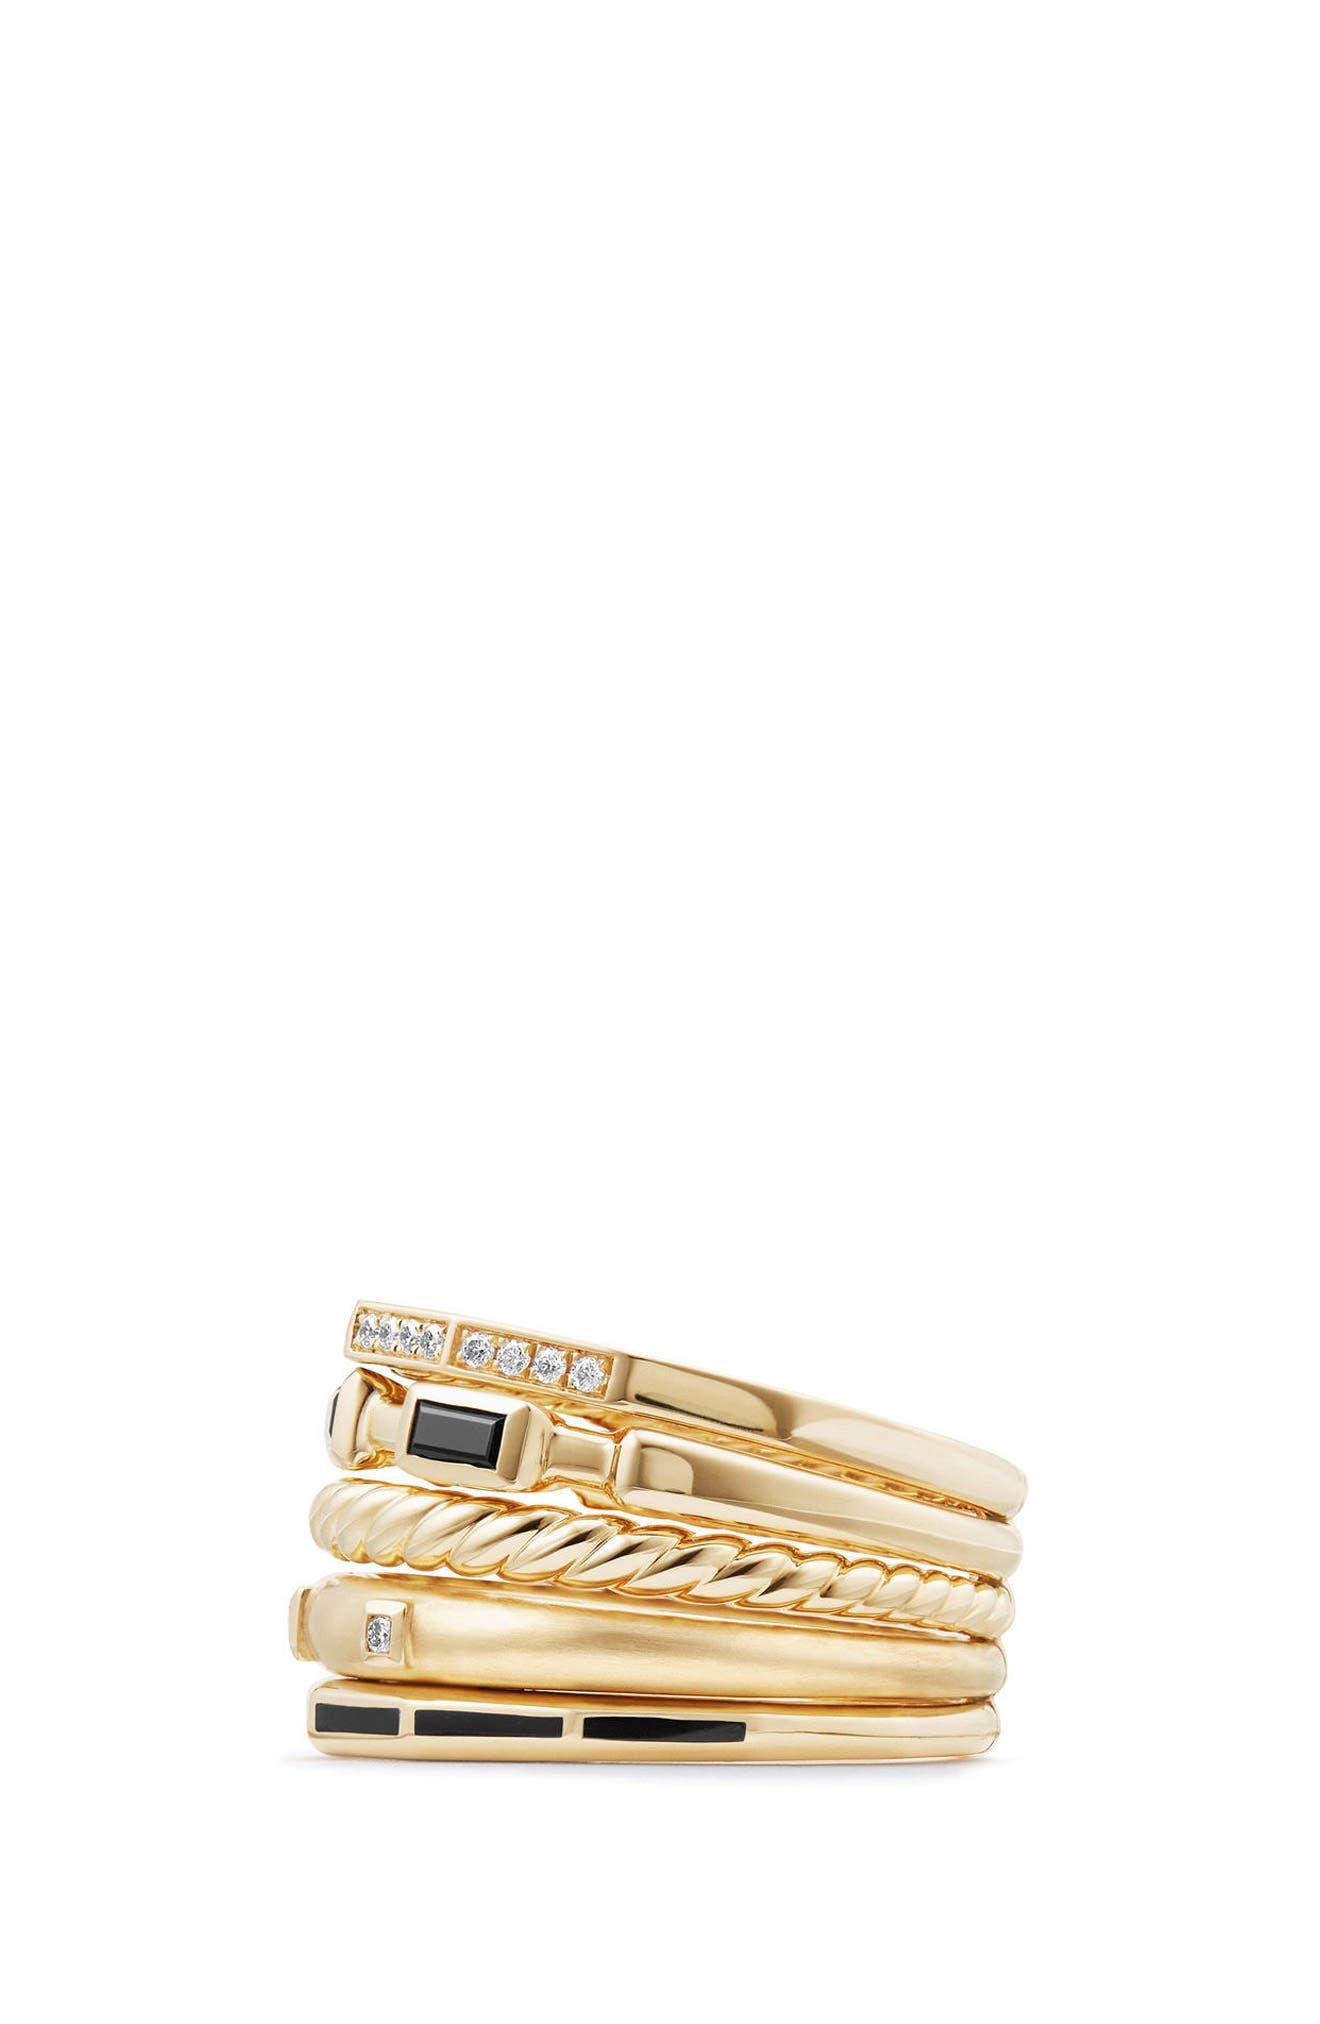 Stax Ring with Black Spinel, Black Enamel & Diamond in 18K Gold, 13mm,                             Alternate thumbnail 2, color,                             BLACK SPINEL